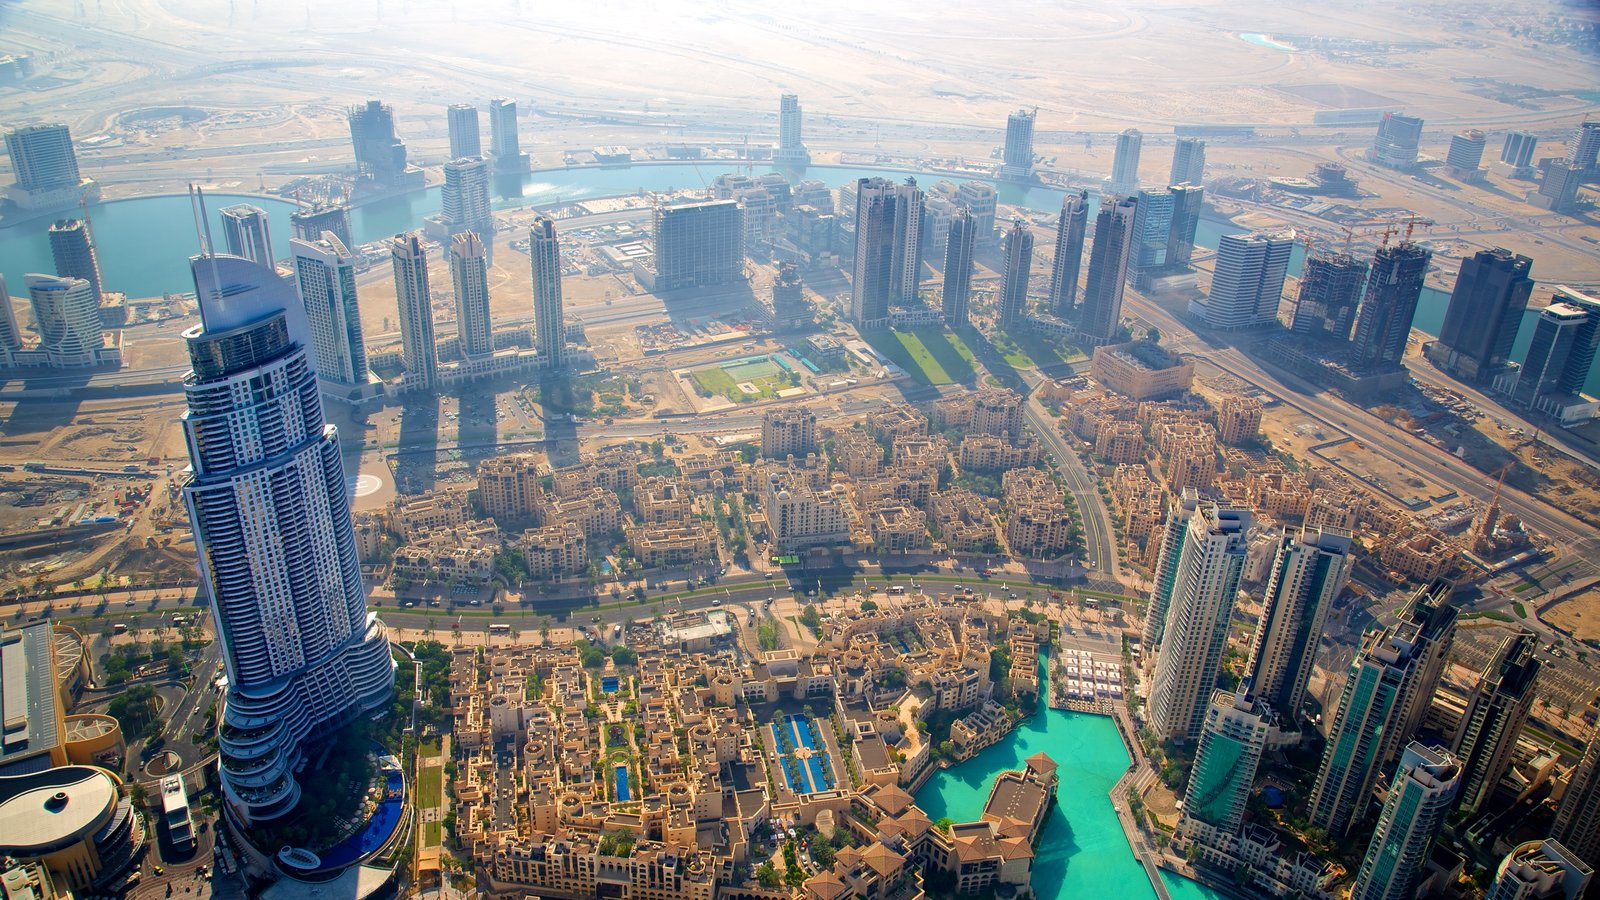 Burj Khalifa which includes city views, a high rise building and a city